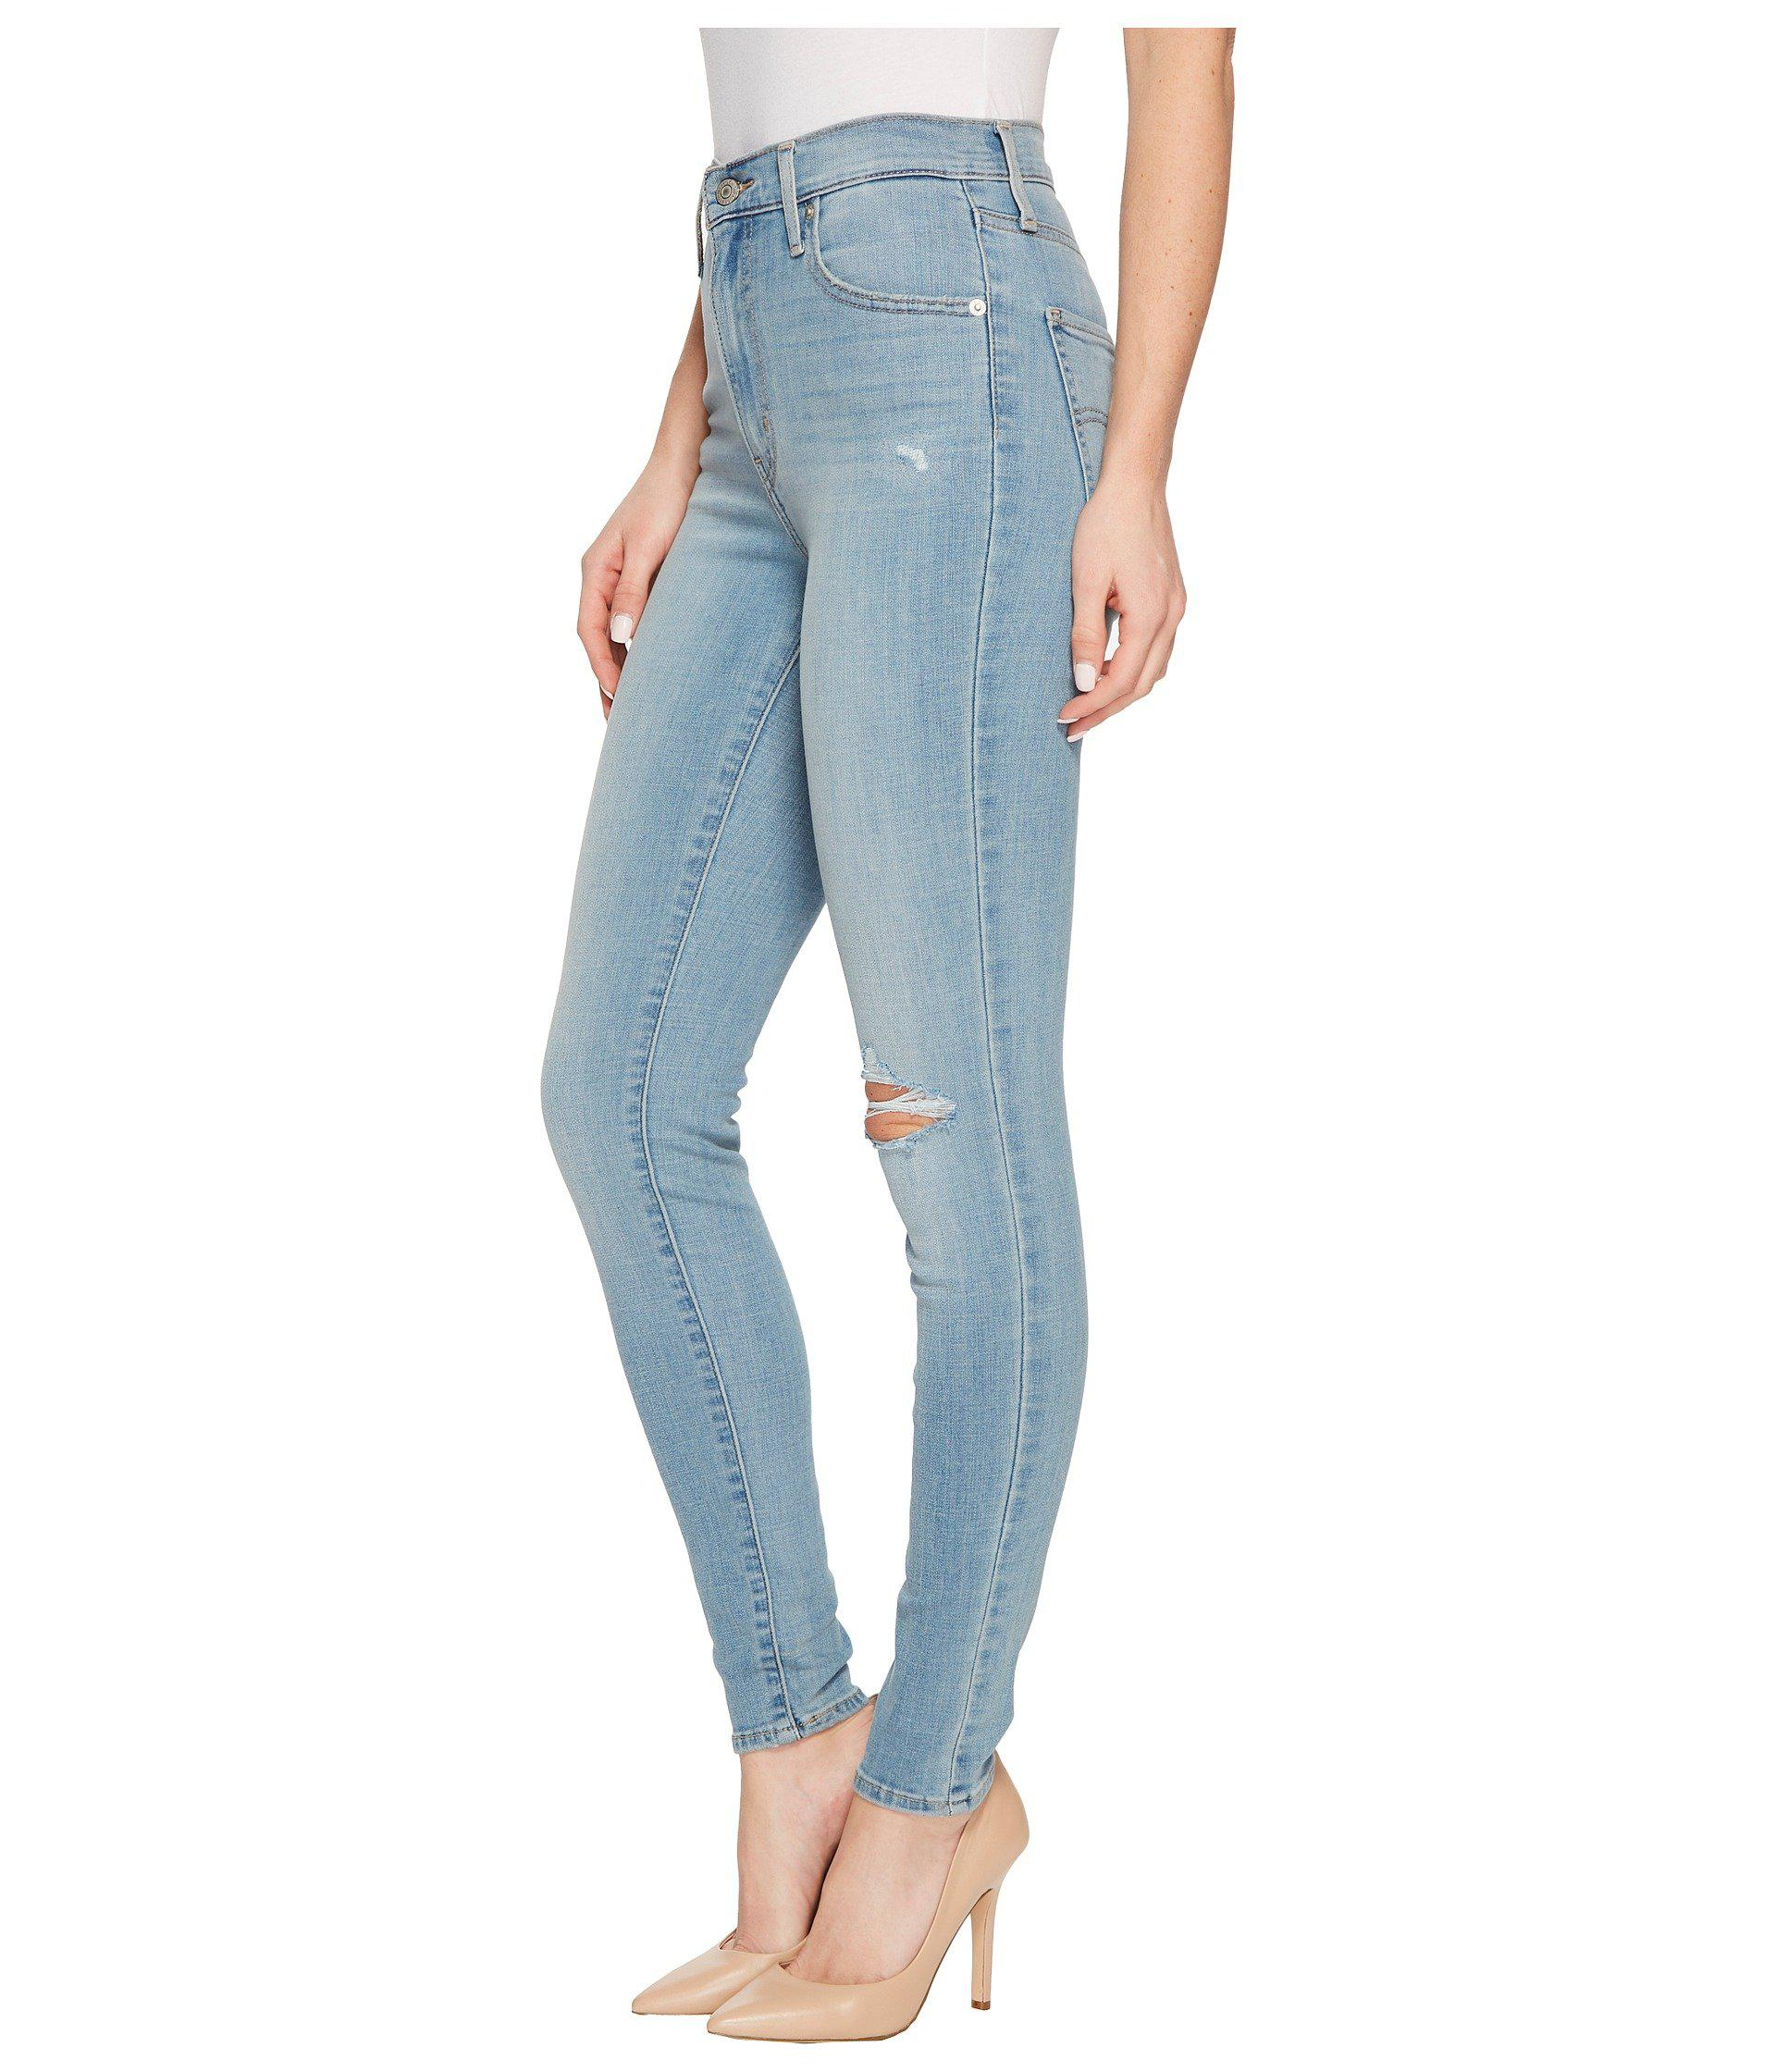 a032c02b03d Lyst - Levi s Levi s(r) Womens Mile High Super Skinny (real Deal) Women s  Jeans in Blue